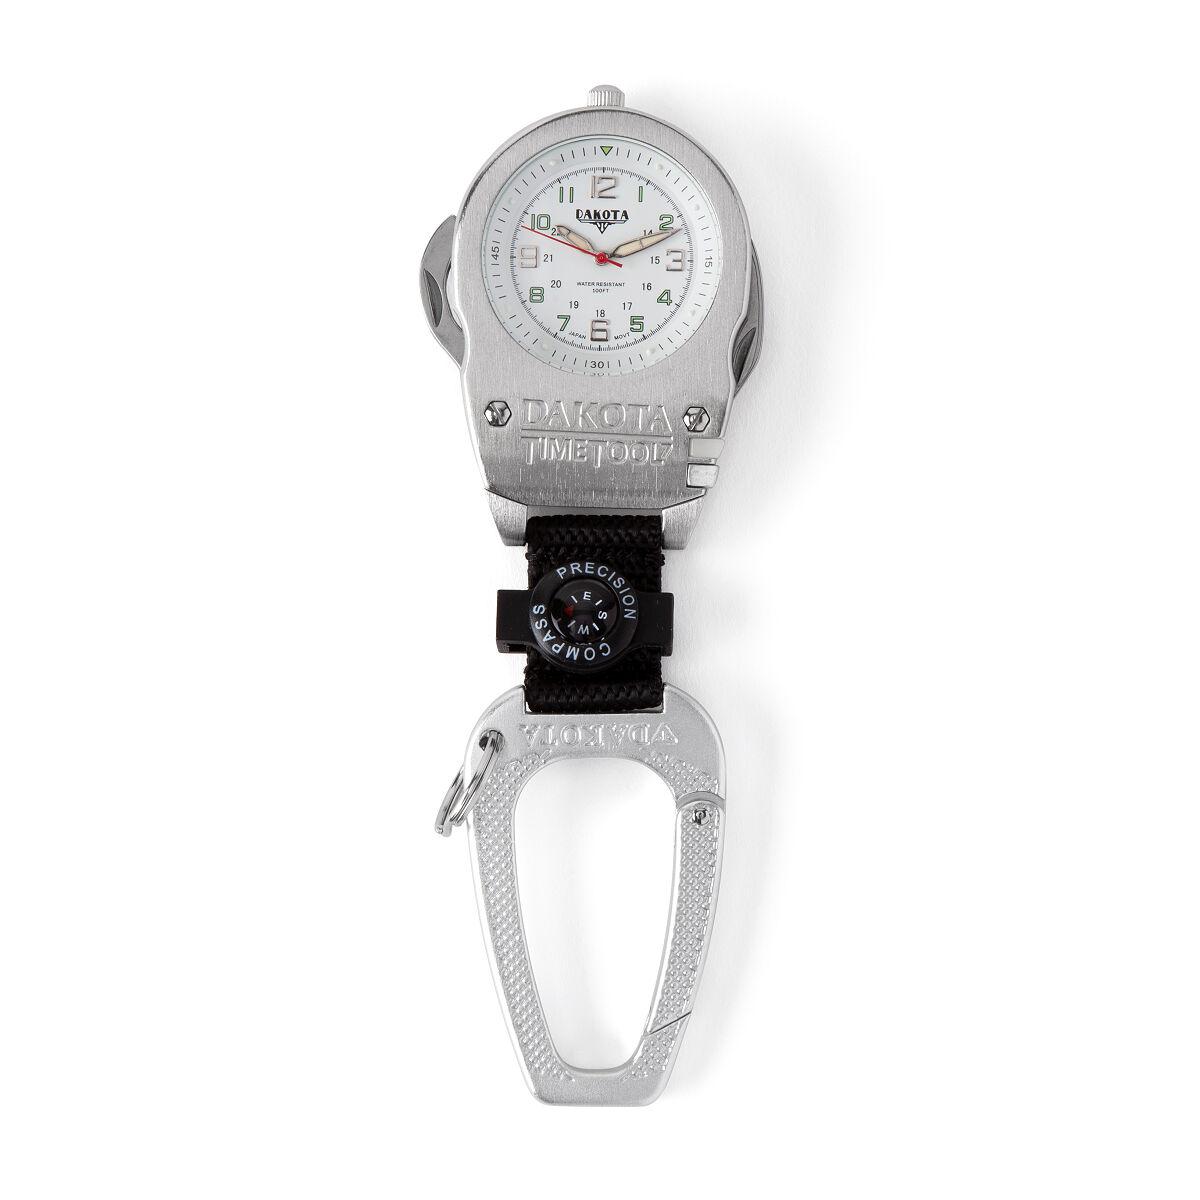 Adventurer Multi Tool Clip Watch Pocket Multi Tool